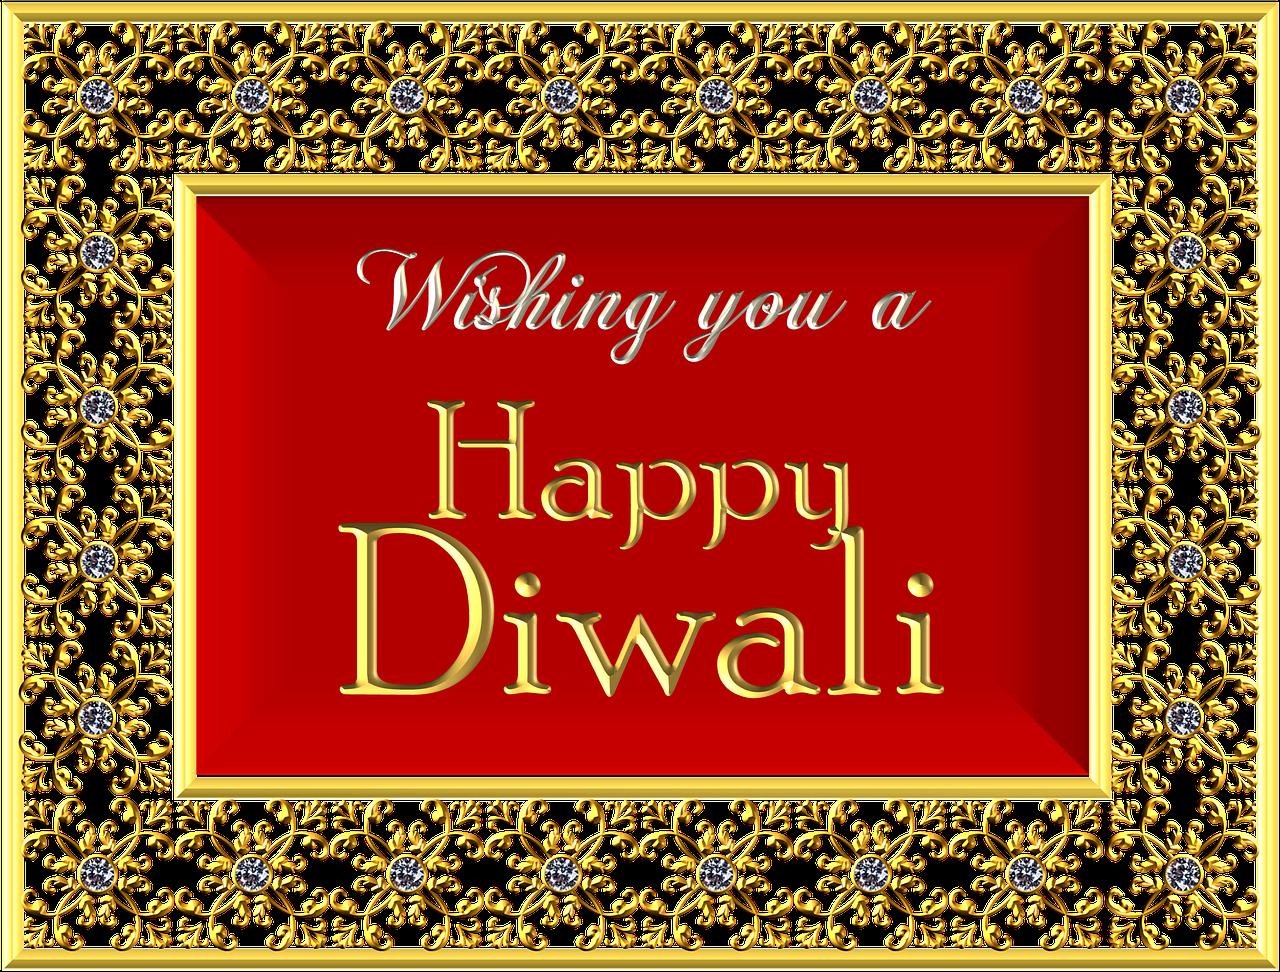 happy diwali greeting cards designs 2018 free diwali greetings